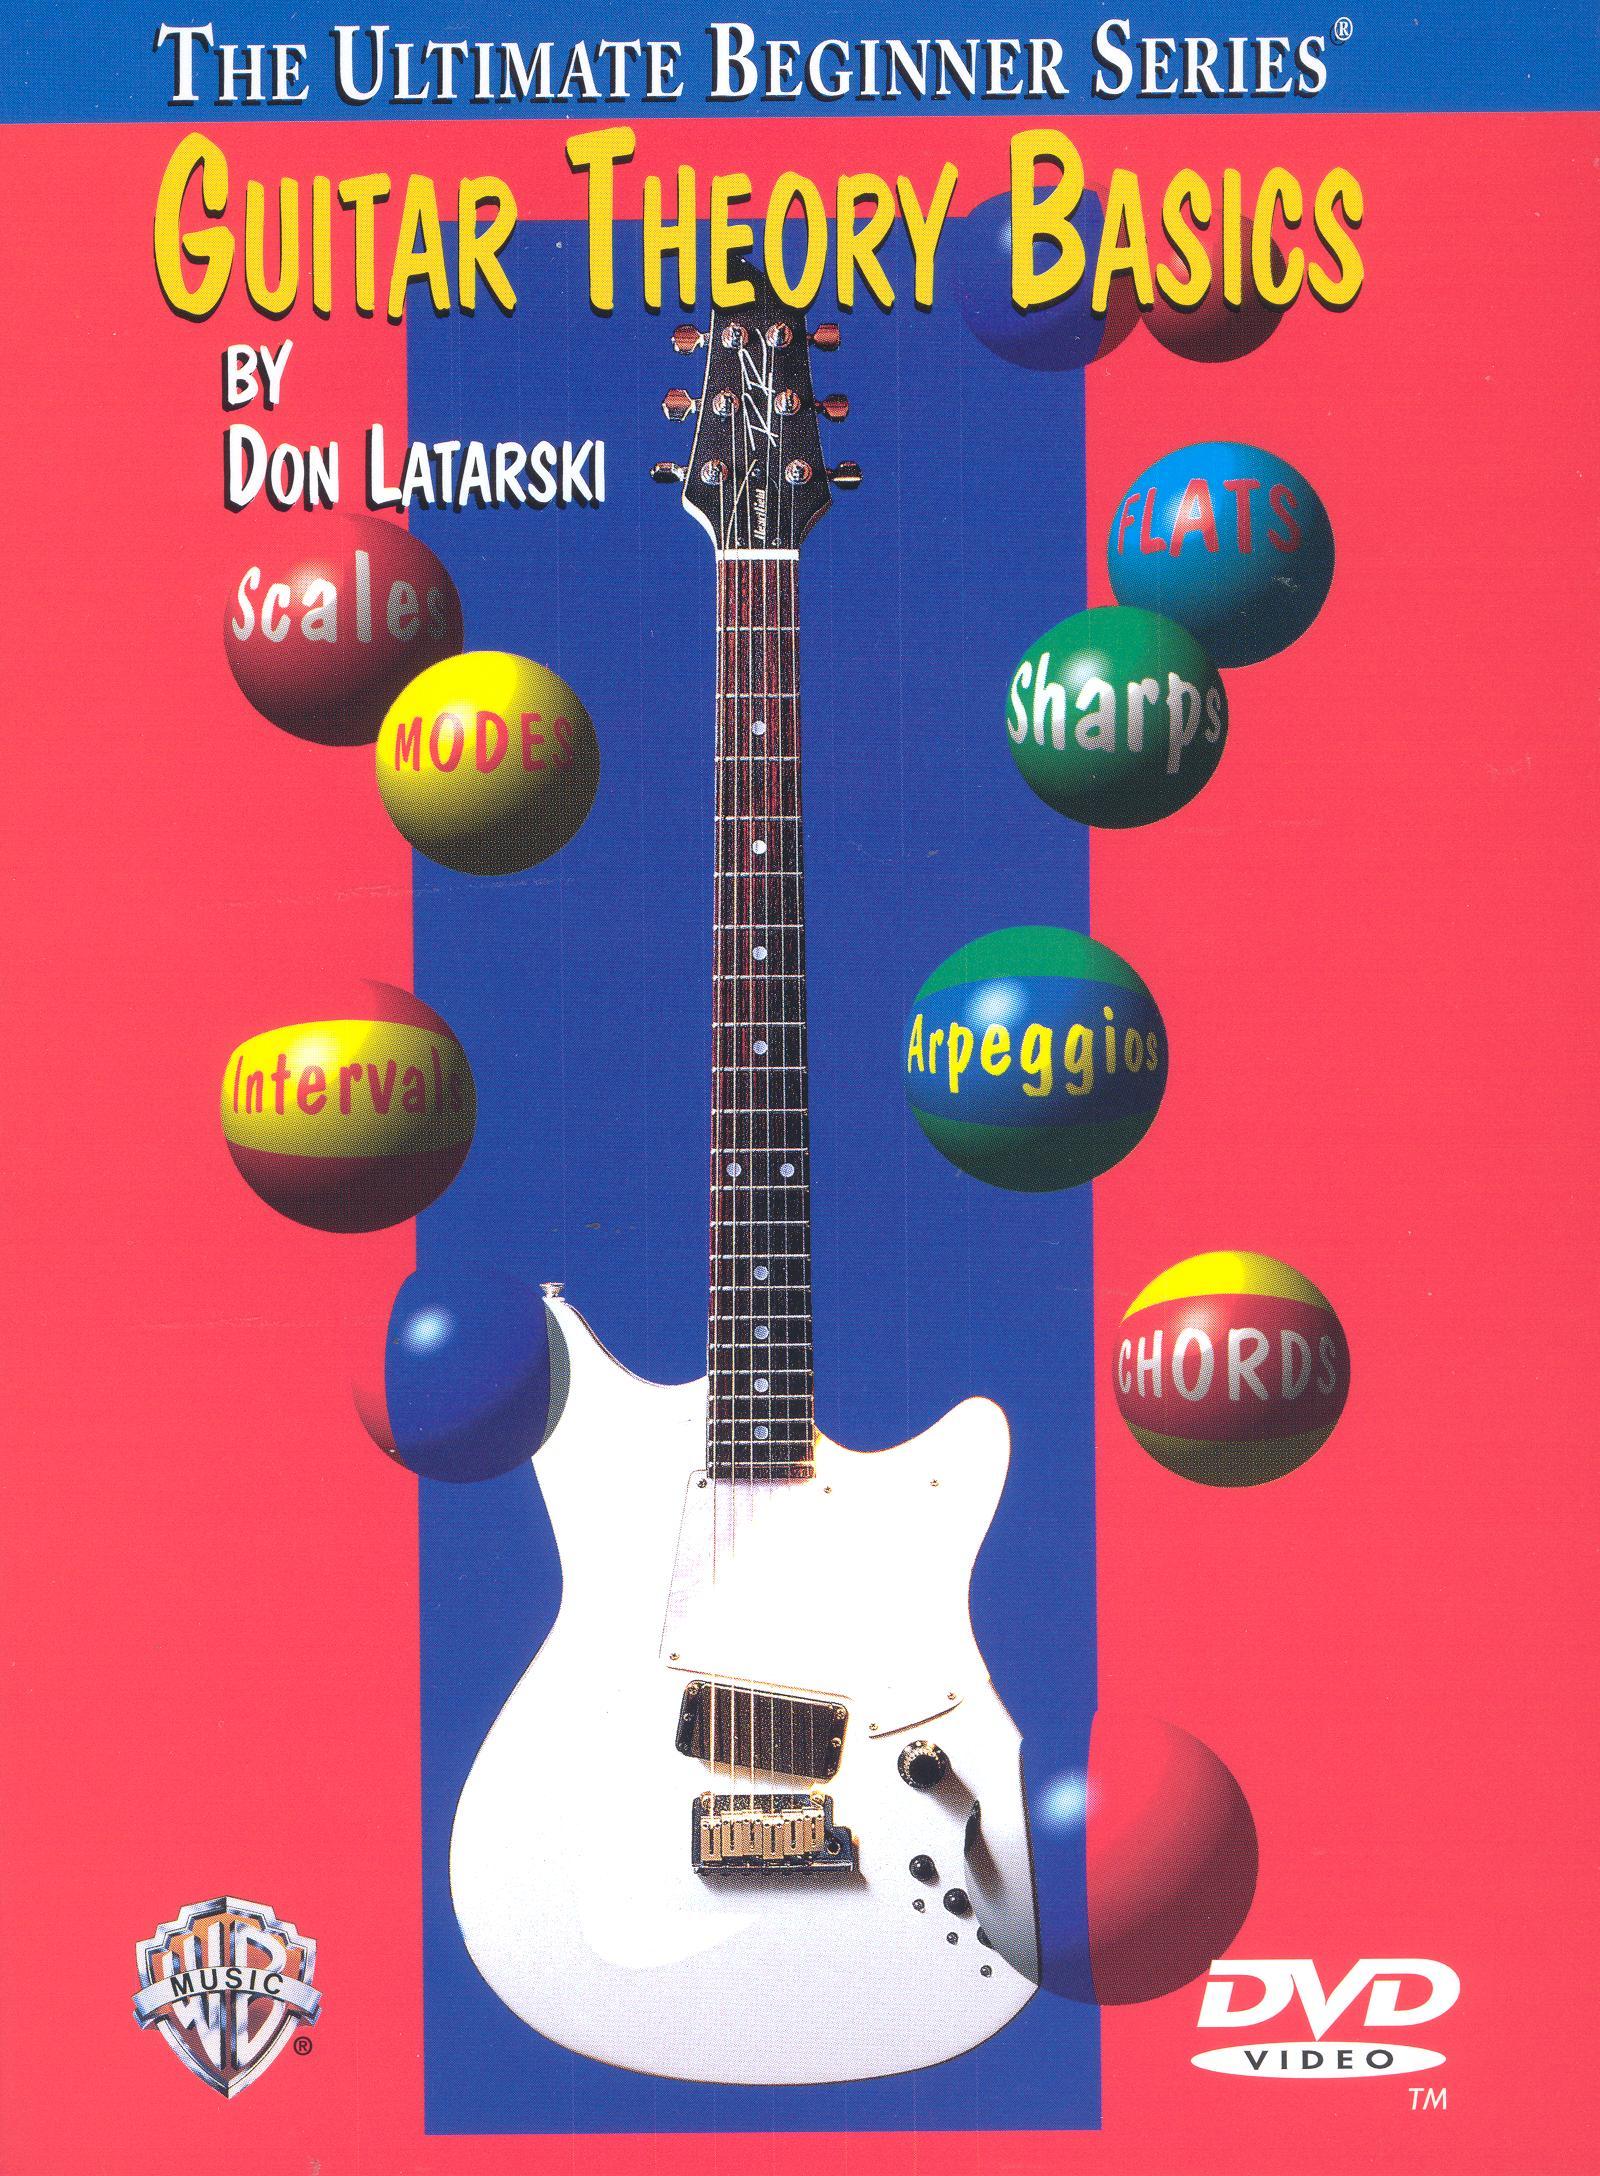 Ultimate Beginner: Basics of Guitar Theory